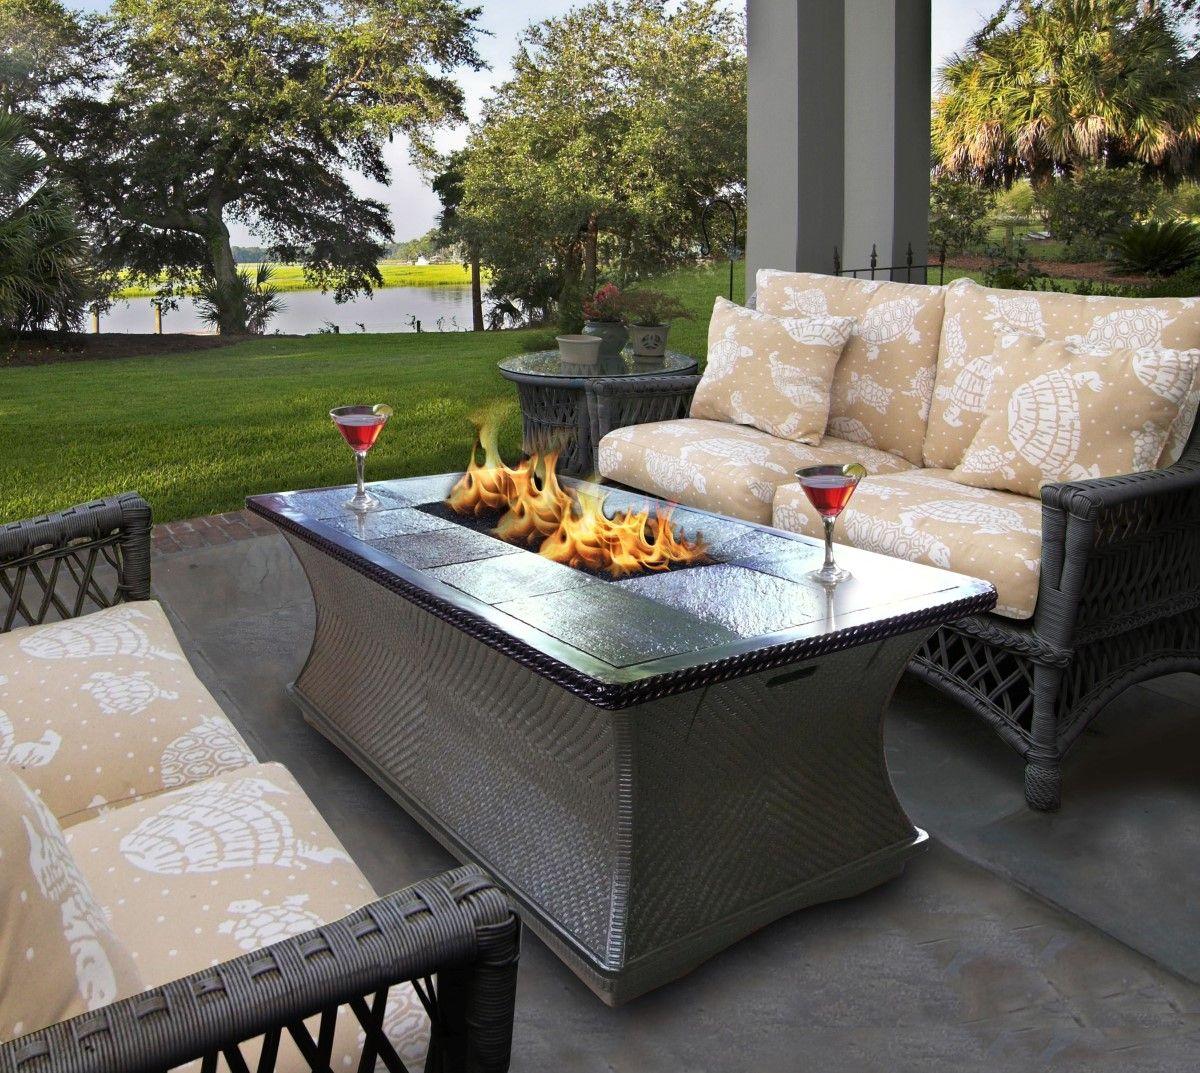 Deck Propane Fire Pit Fire Pit Coffee Table Fire Pit Decor